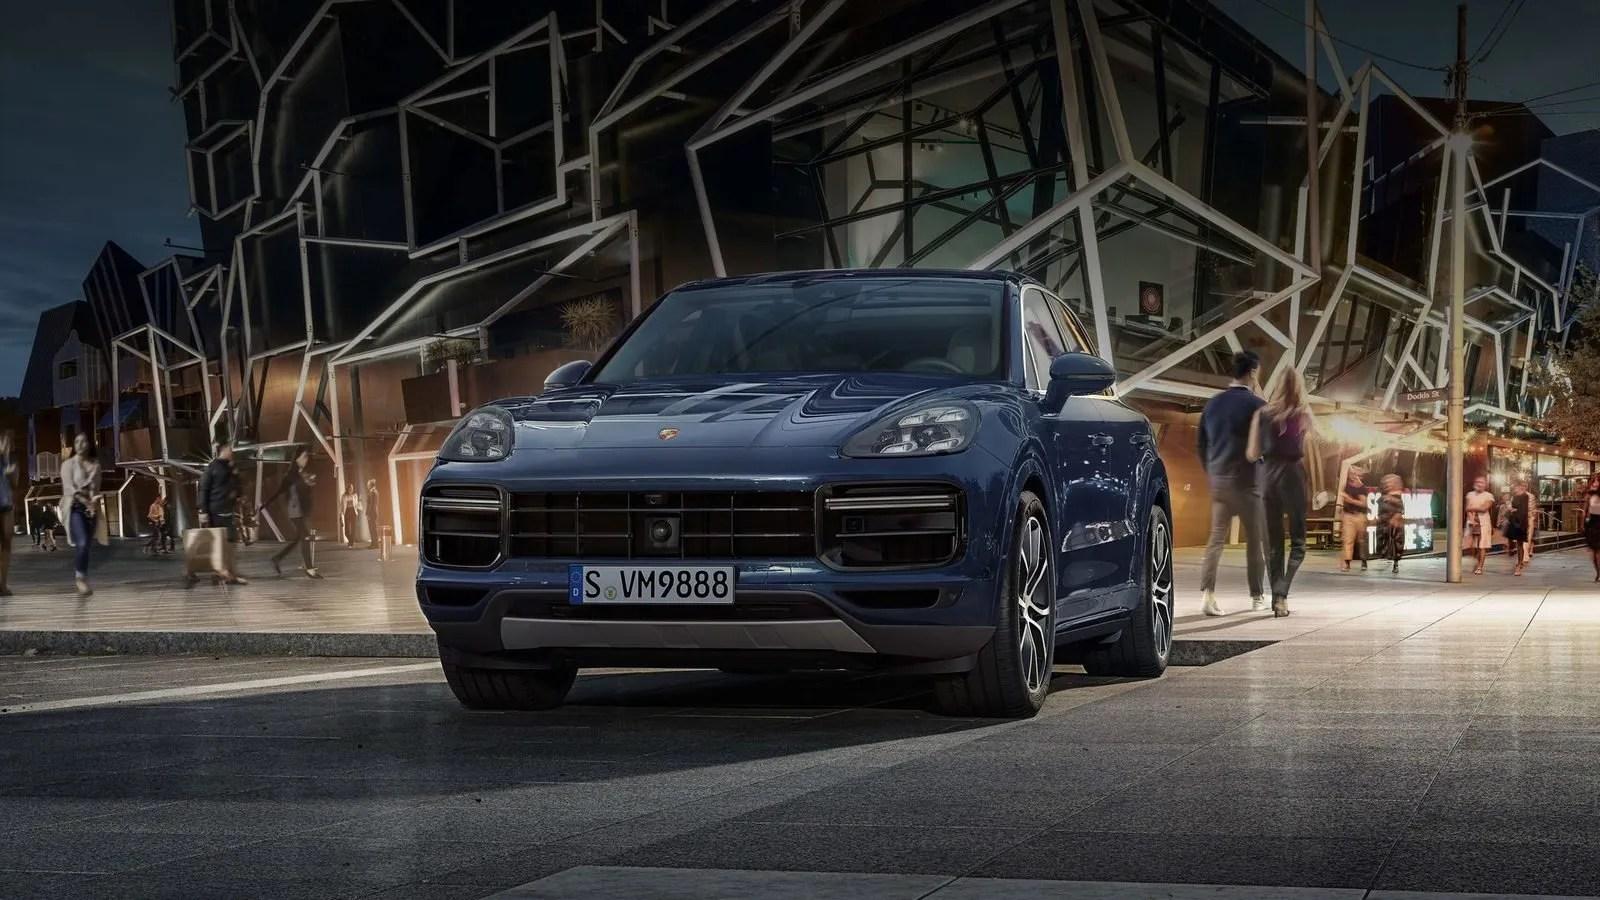 Audi Car Wallpaper Download 2019 Porsche Cayenne Turbo Pictures Photos Wallpapers